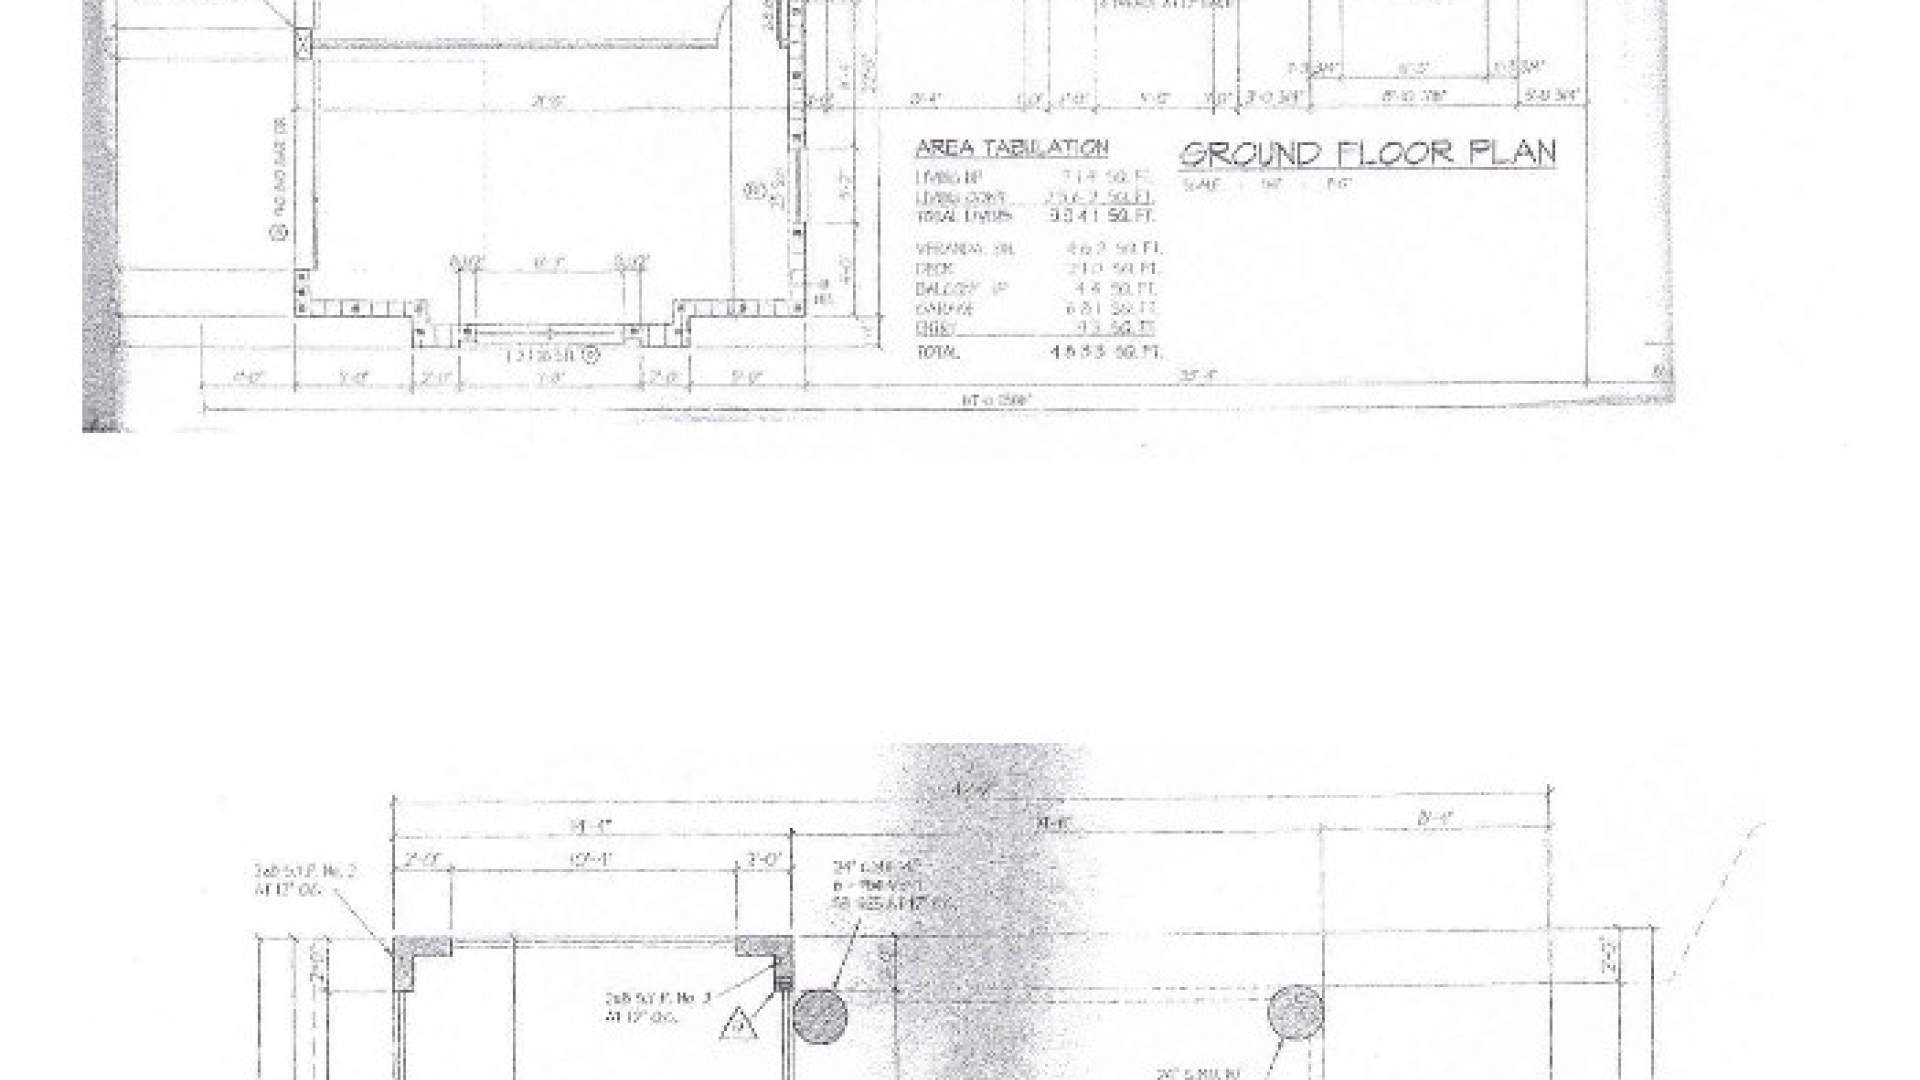 Großzügig Whirlpool Trockner Gew9200lw1 Schaltplan Fotos ...